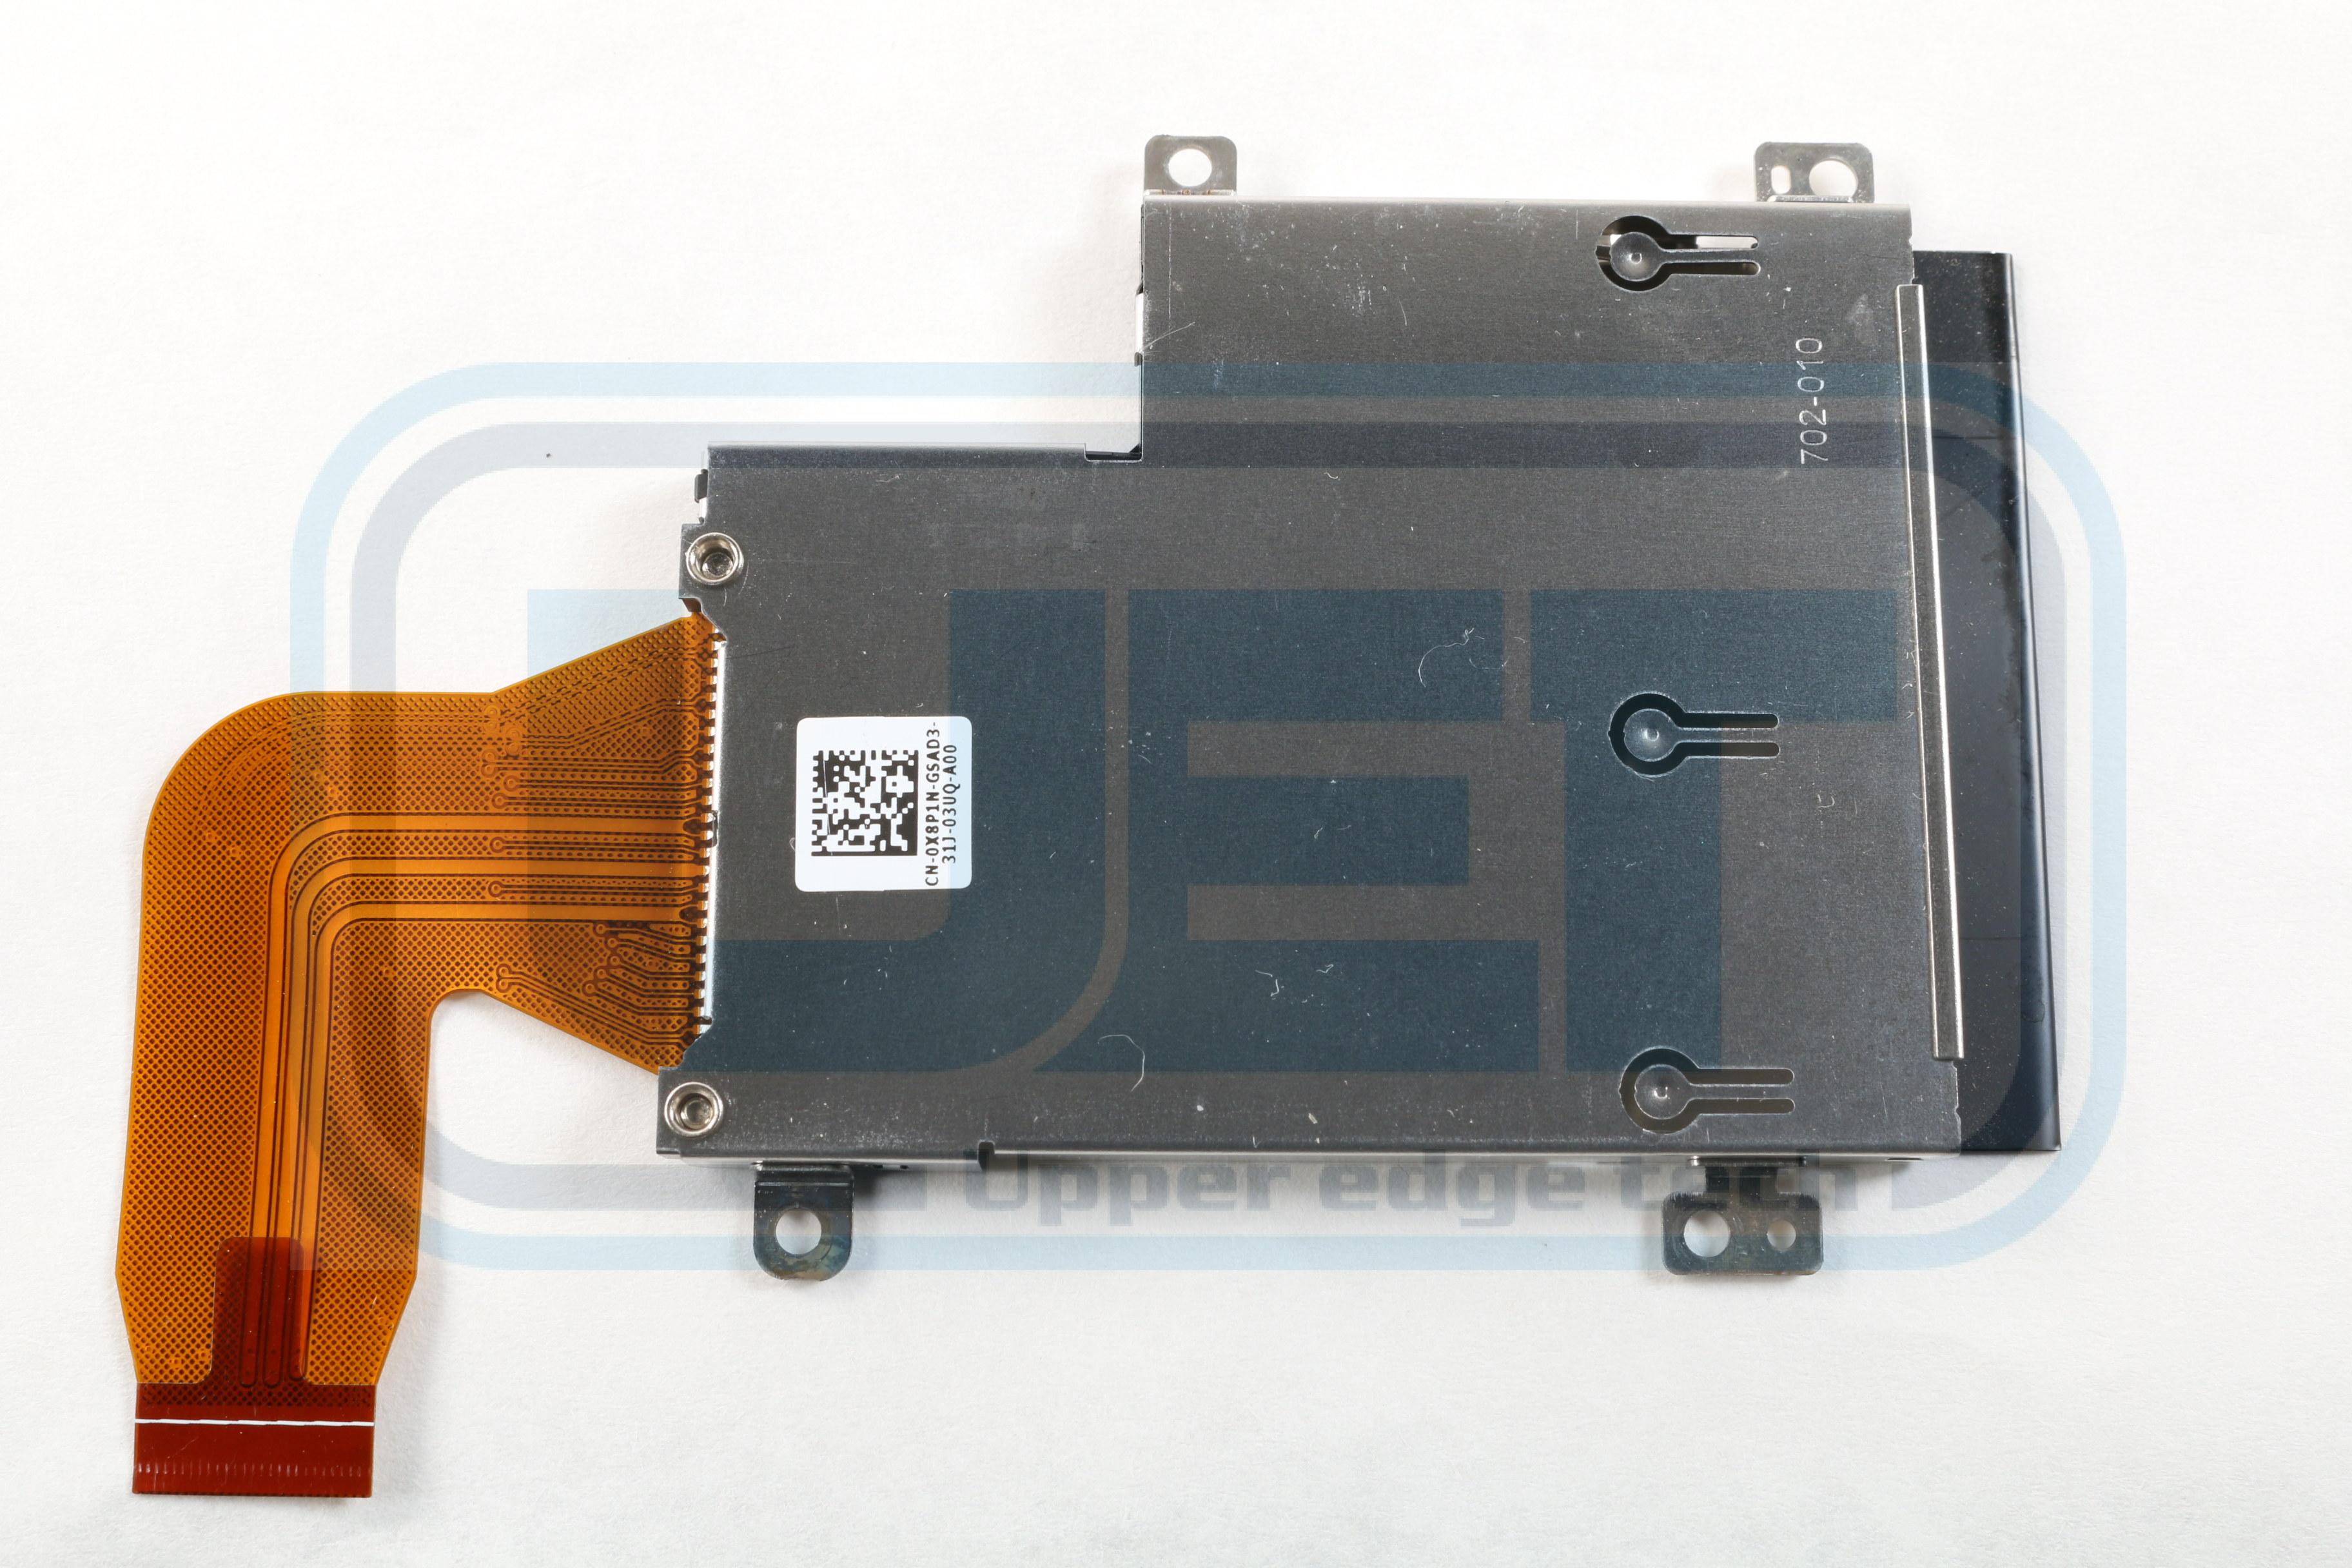 HDD Hard drive caddy for dell precision M4600 M4700 M6600 M6700 M4800 M68Q JB